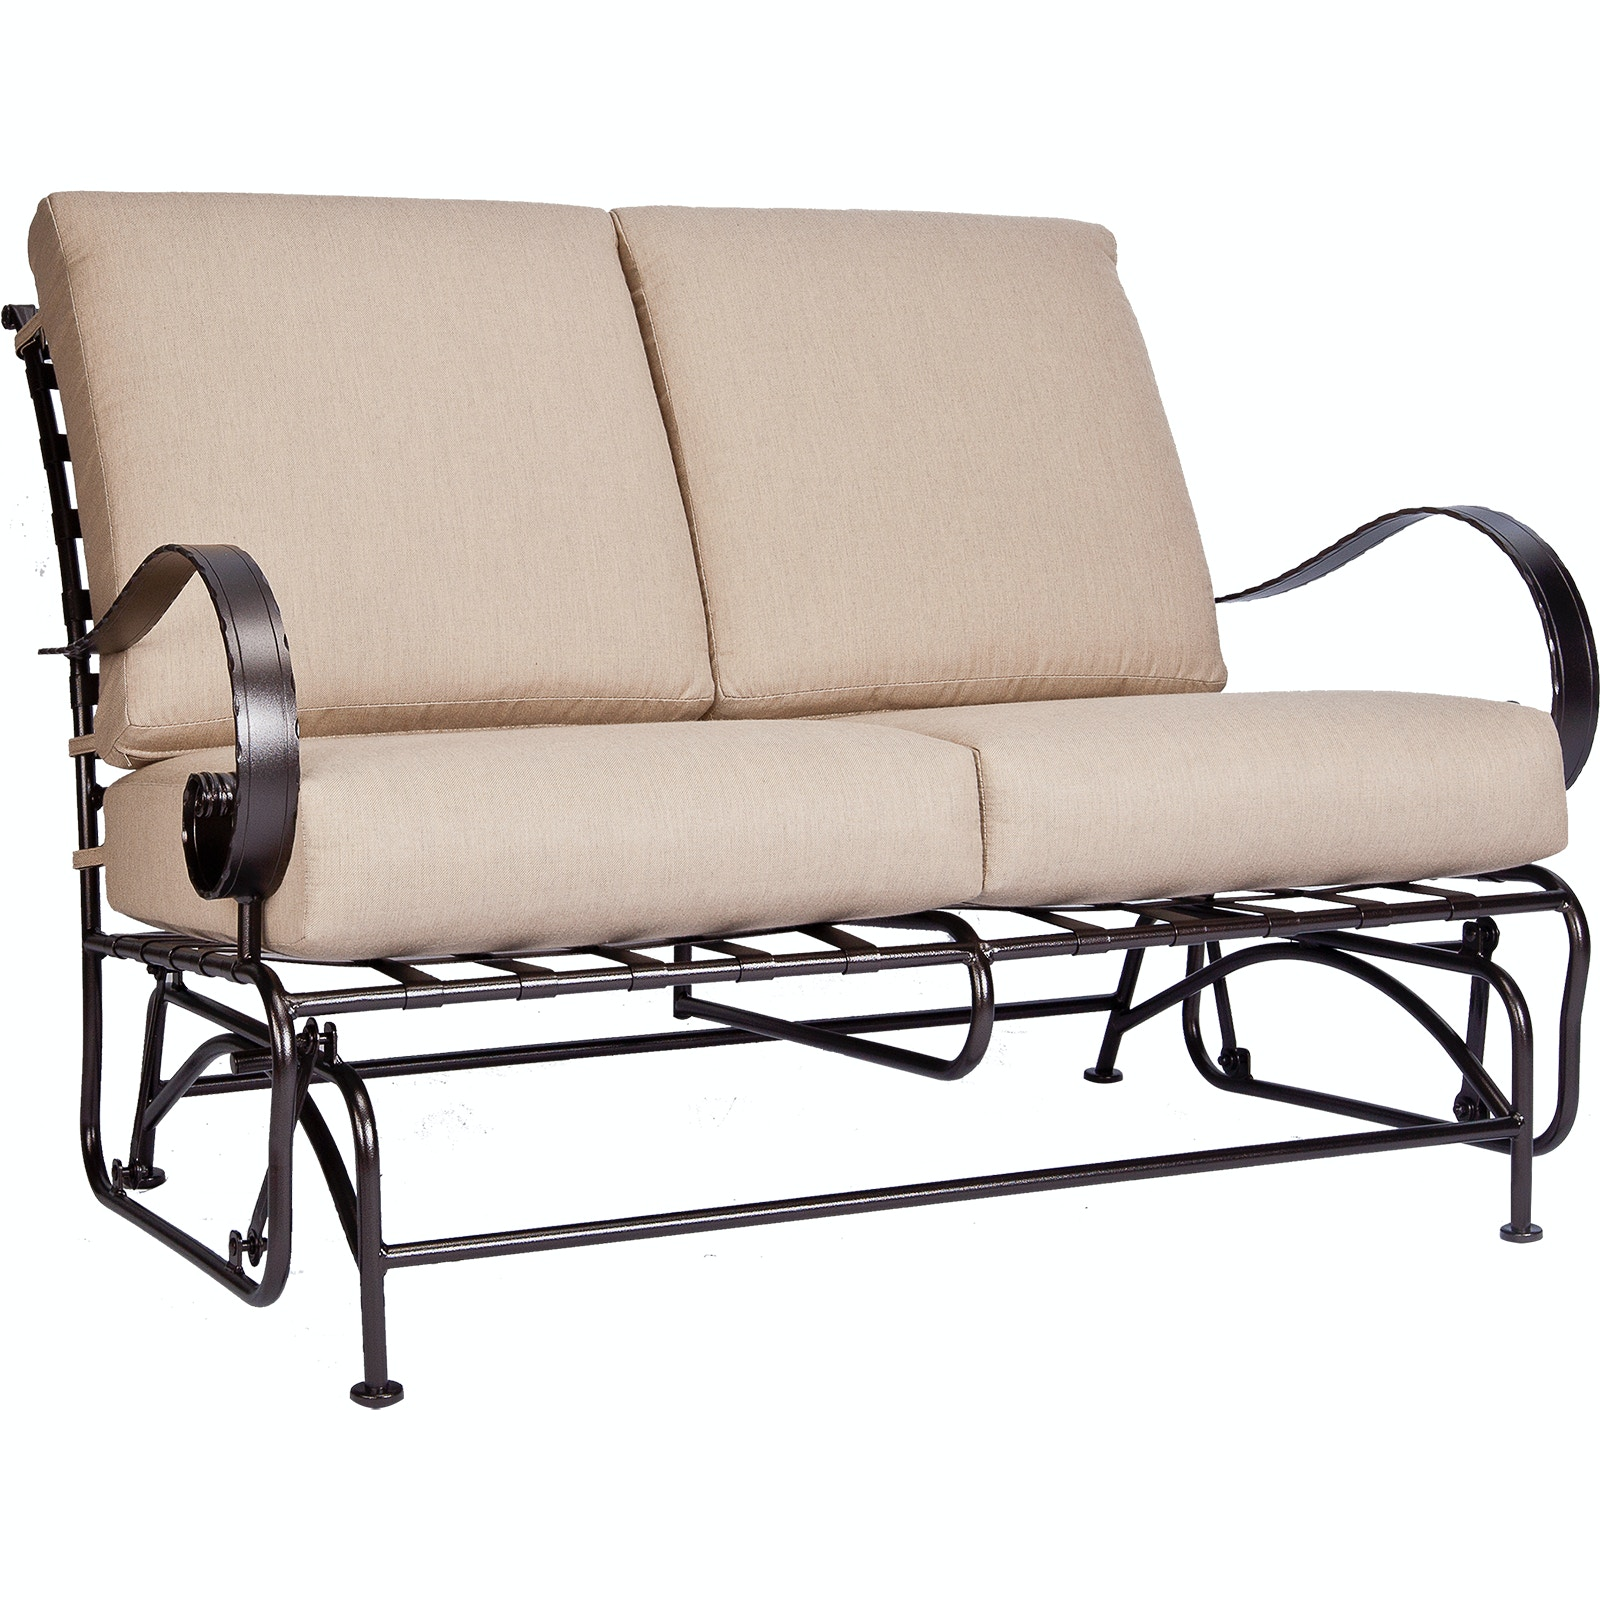 OW Lee Furniture Classico W Love Seat Glider 956 2GW